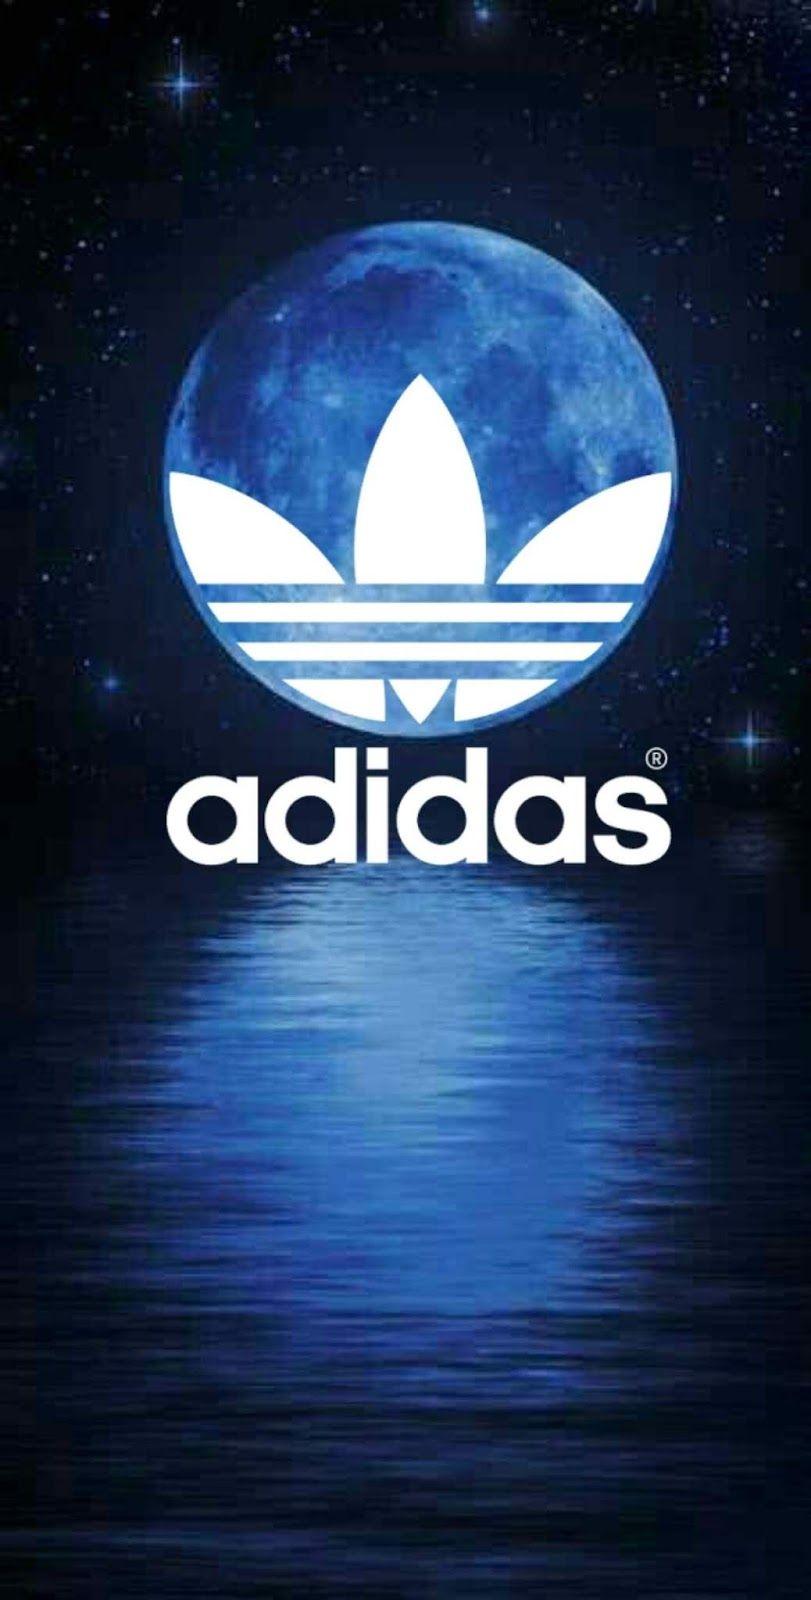 Adidas Iphone Wallpapers Hd Adidas Wallpapers Adidas Iphone Wallpaper Adidas Logo Wallpapers